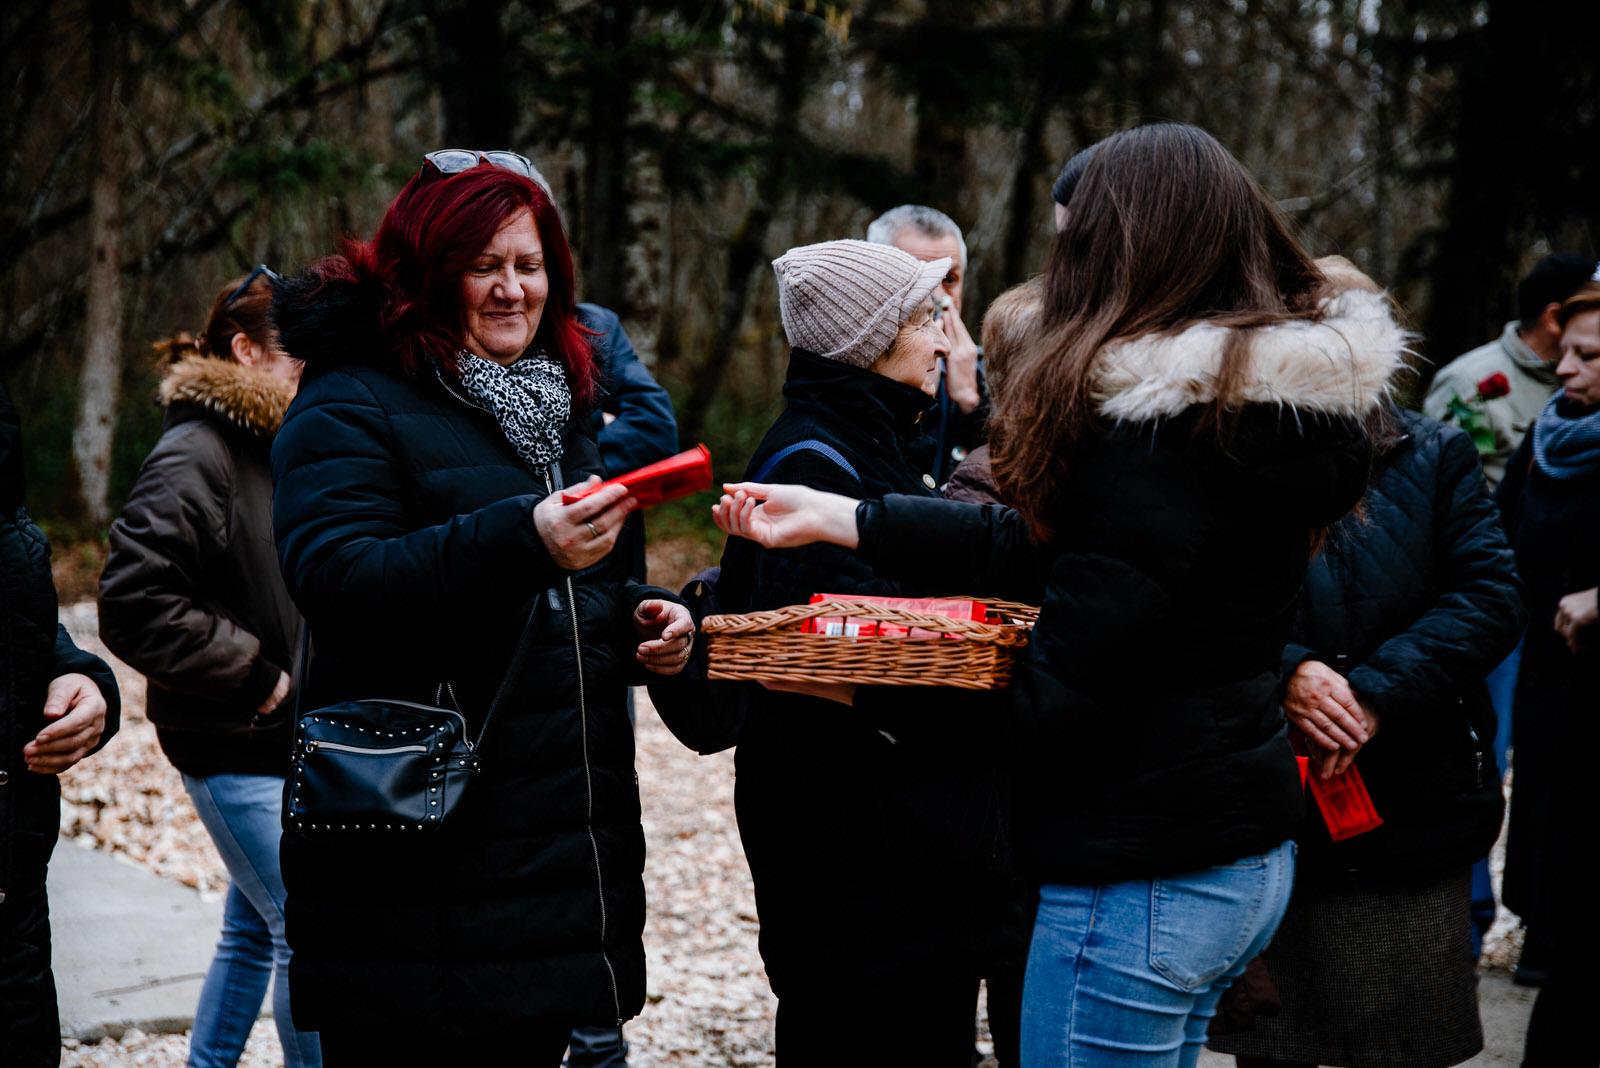 likaclub_gospić_park šuma jasikovac_projekt i video spot_2020 (35)